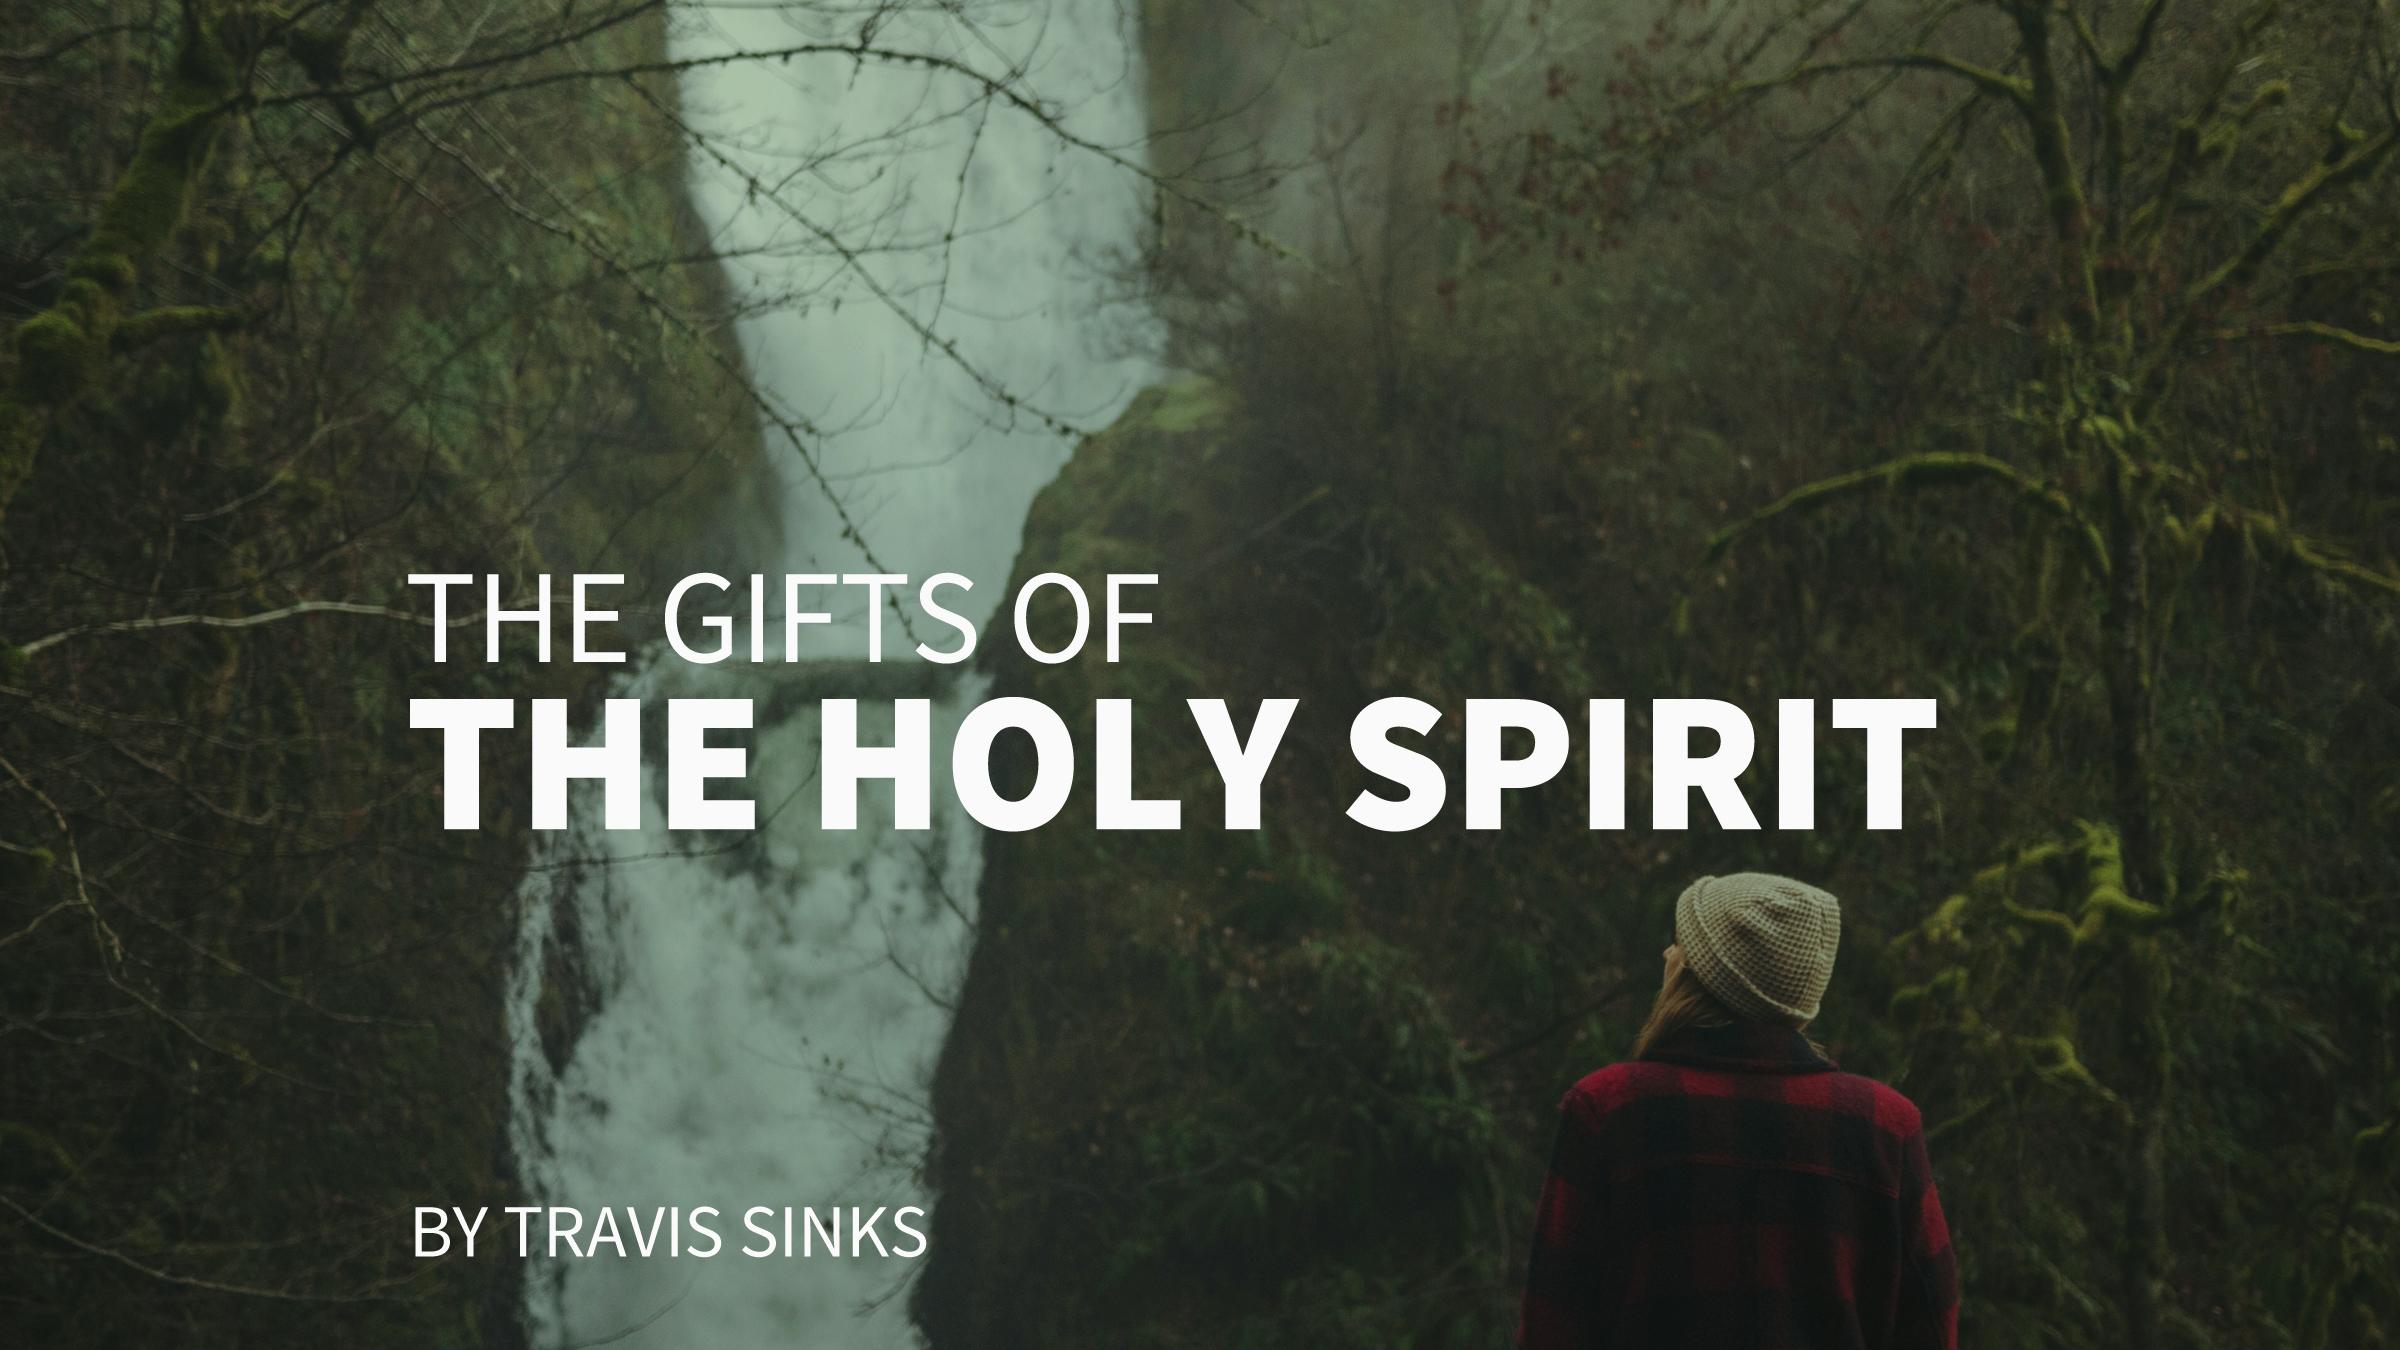 holy spirit gifts by travis.jpg